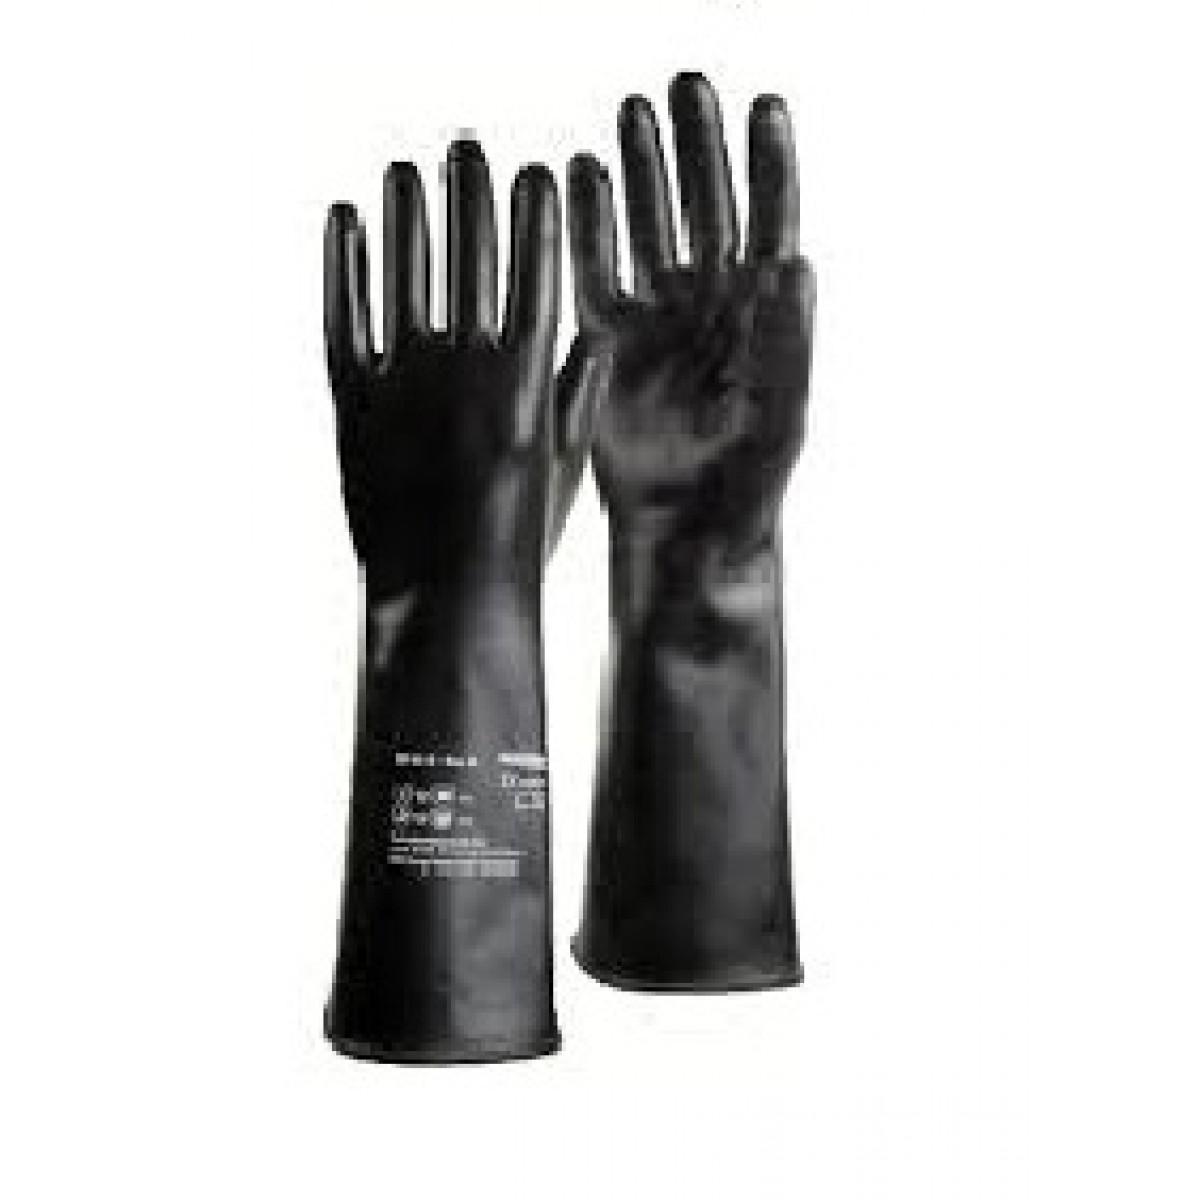 Găng tay cao su chống acid Trung Quốc - NEO400+Marigold